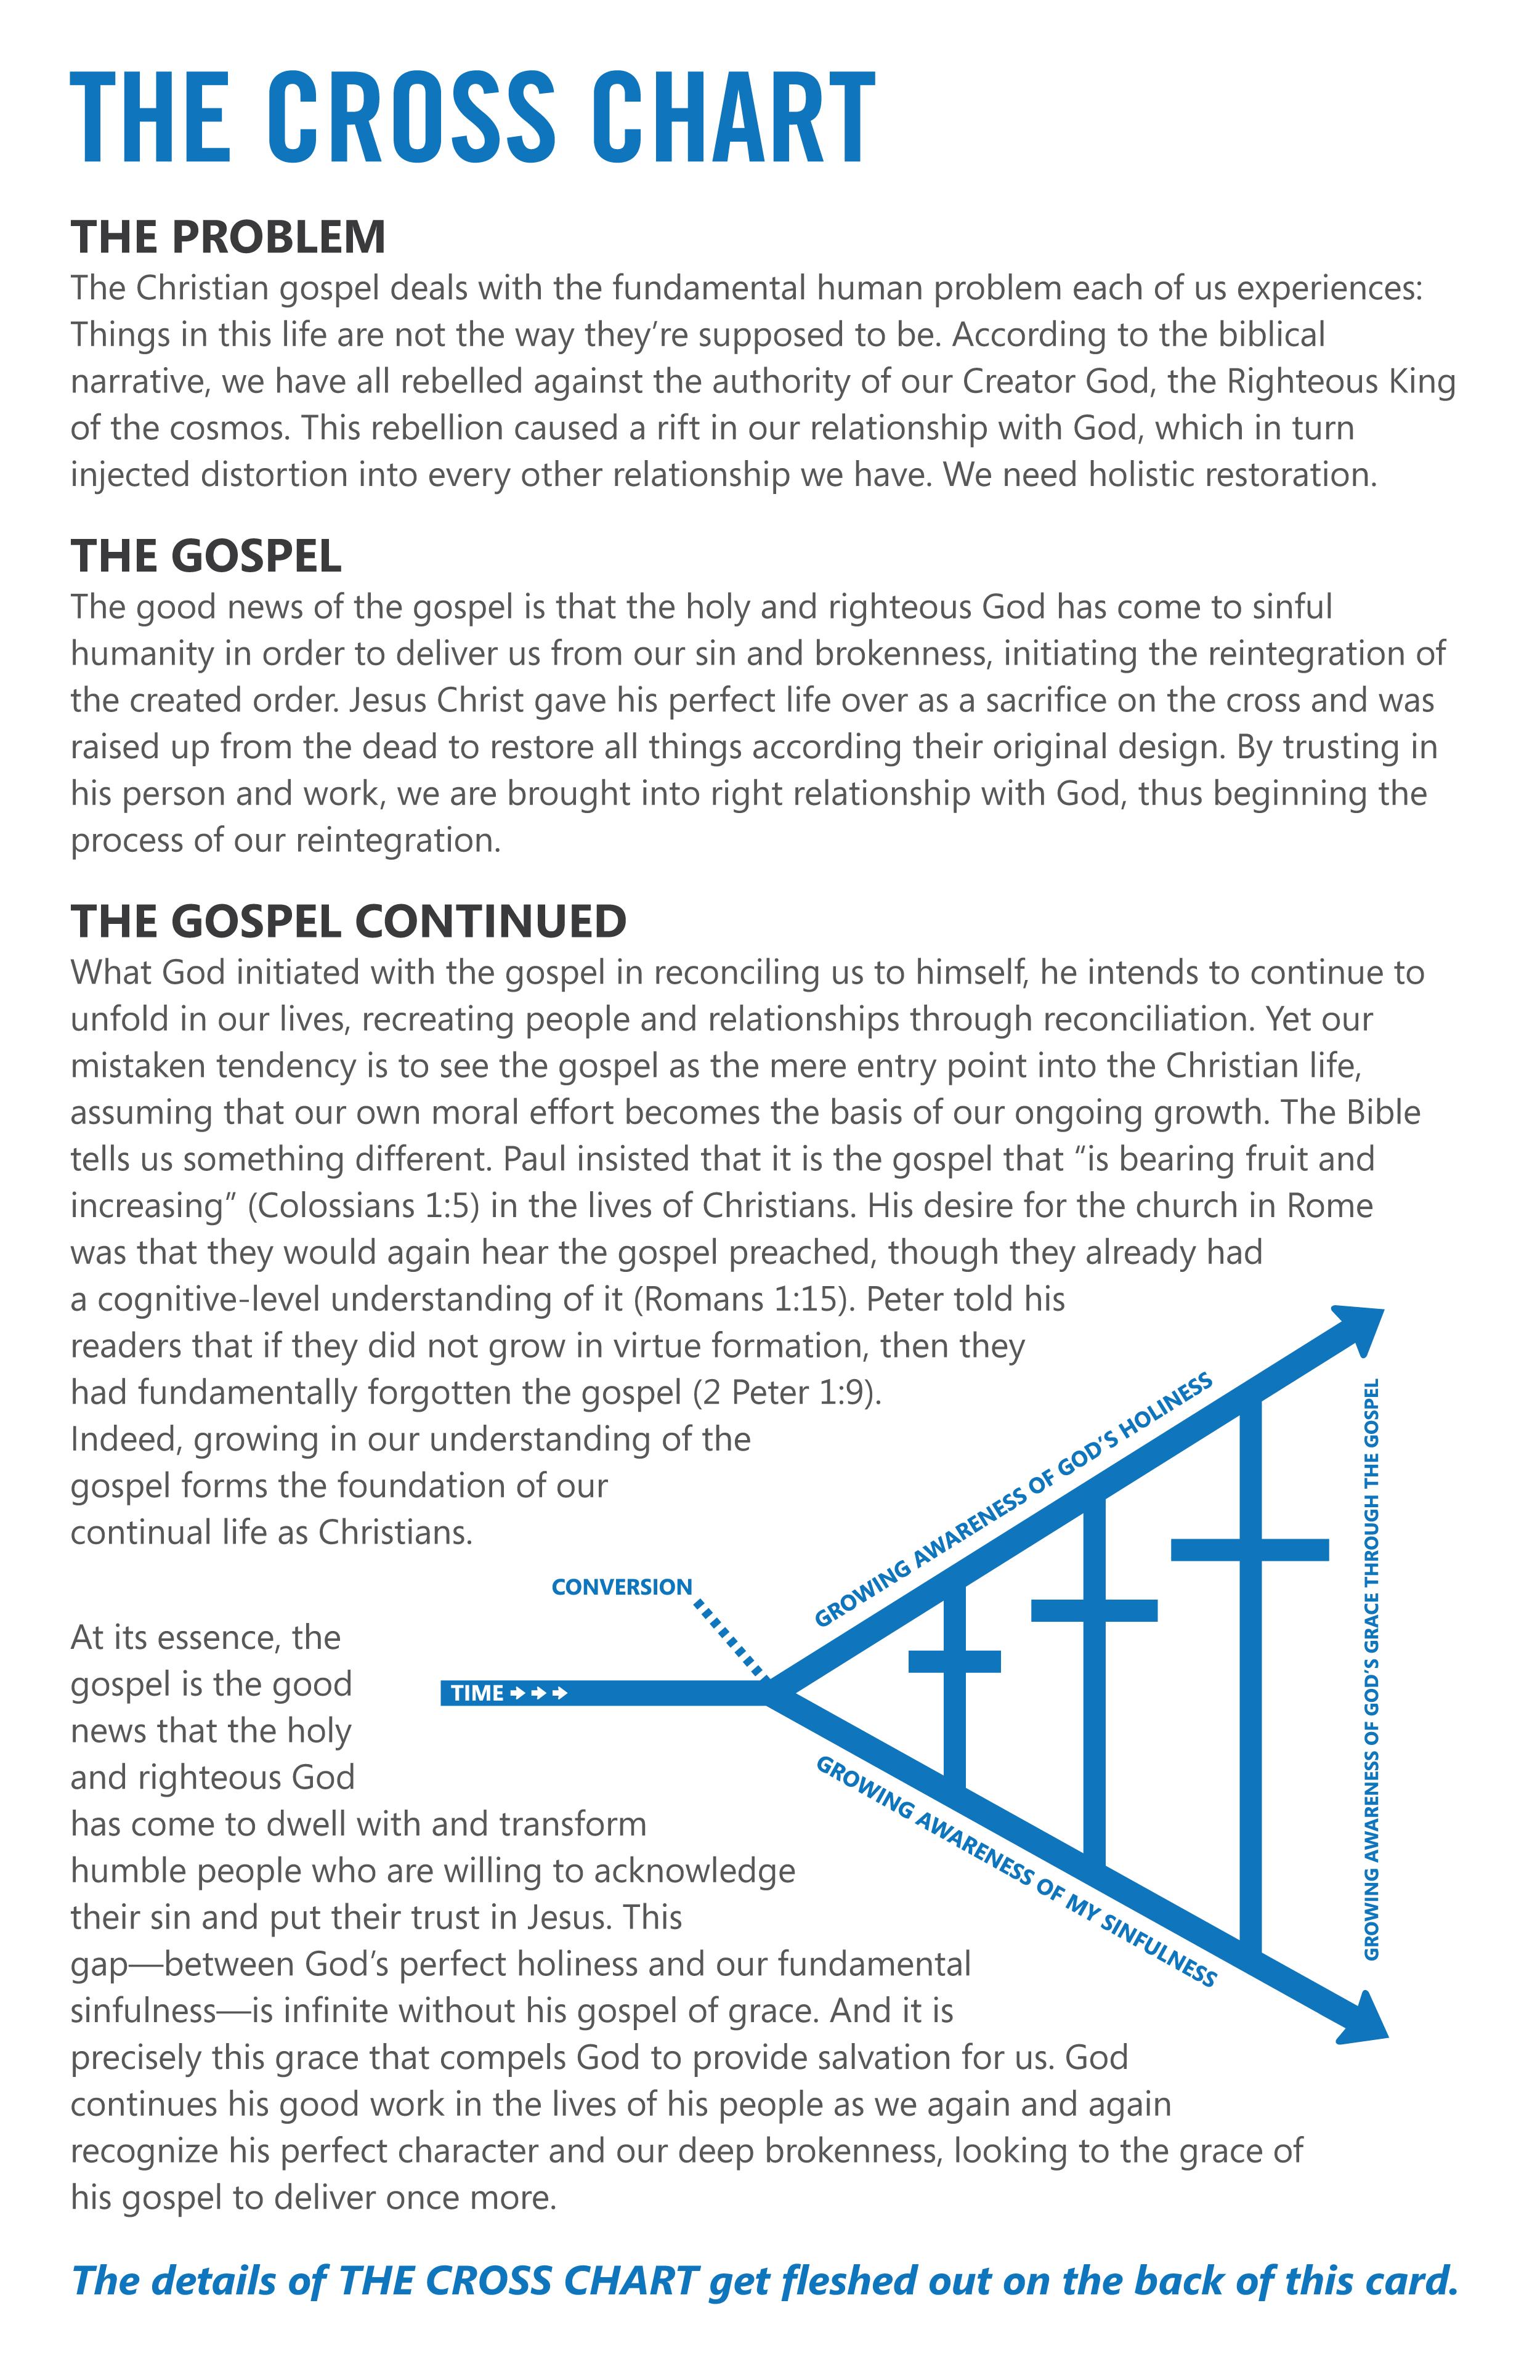 The Cross Chart